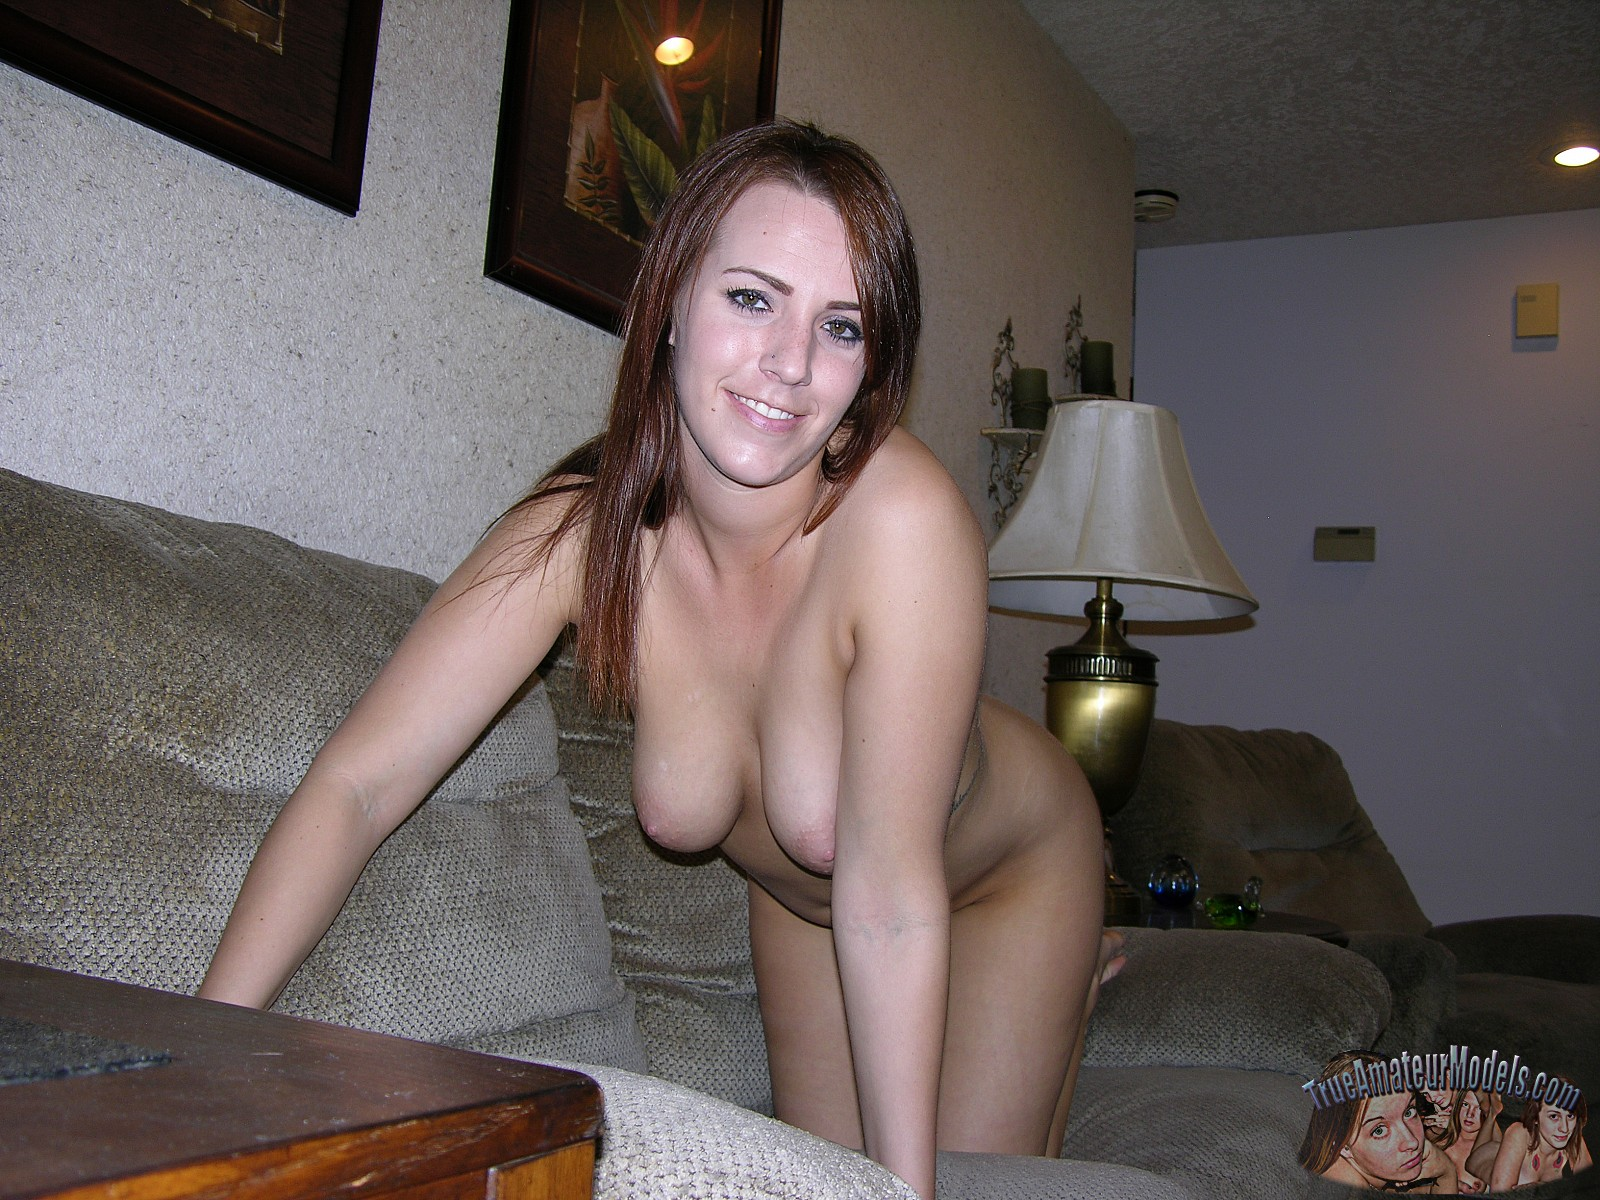 smiling-nude-amature